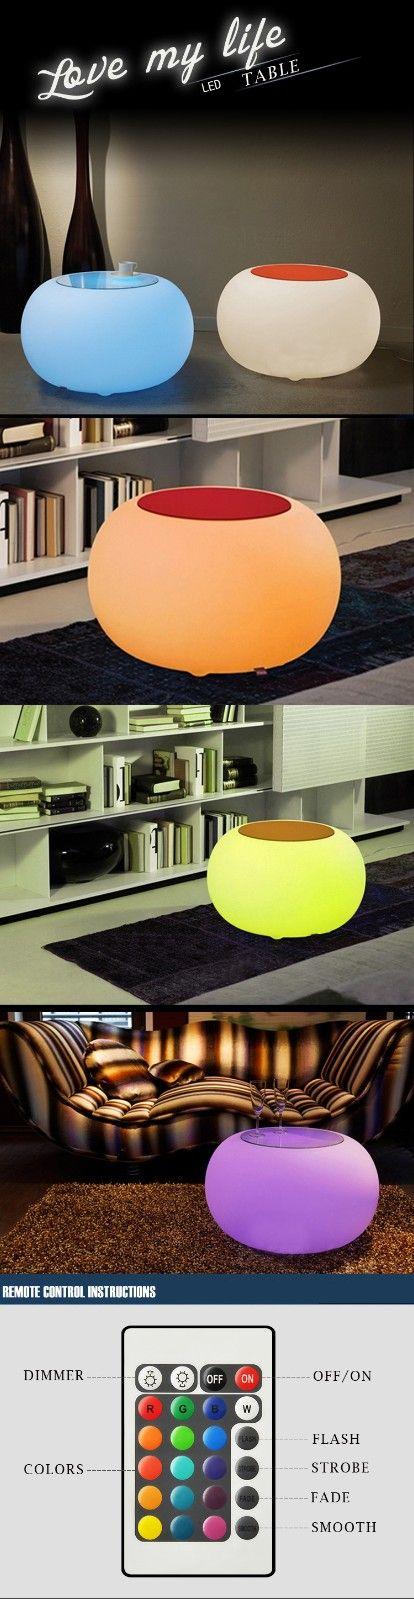 US Warehouse | Creative Remote Control LED Bar Table KTV Bar Home Garden Light Decor